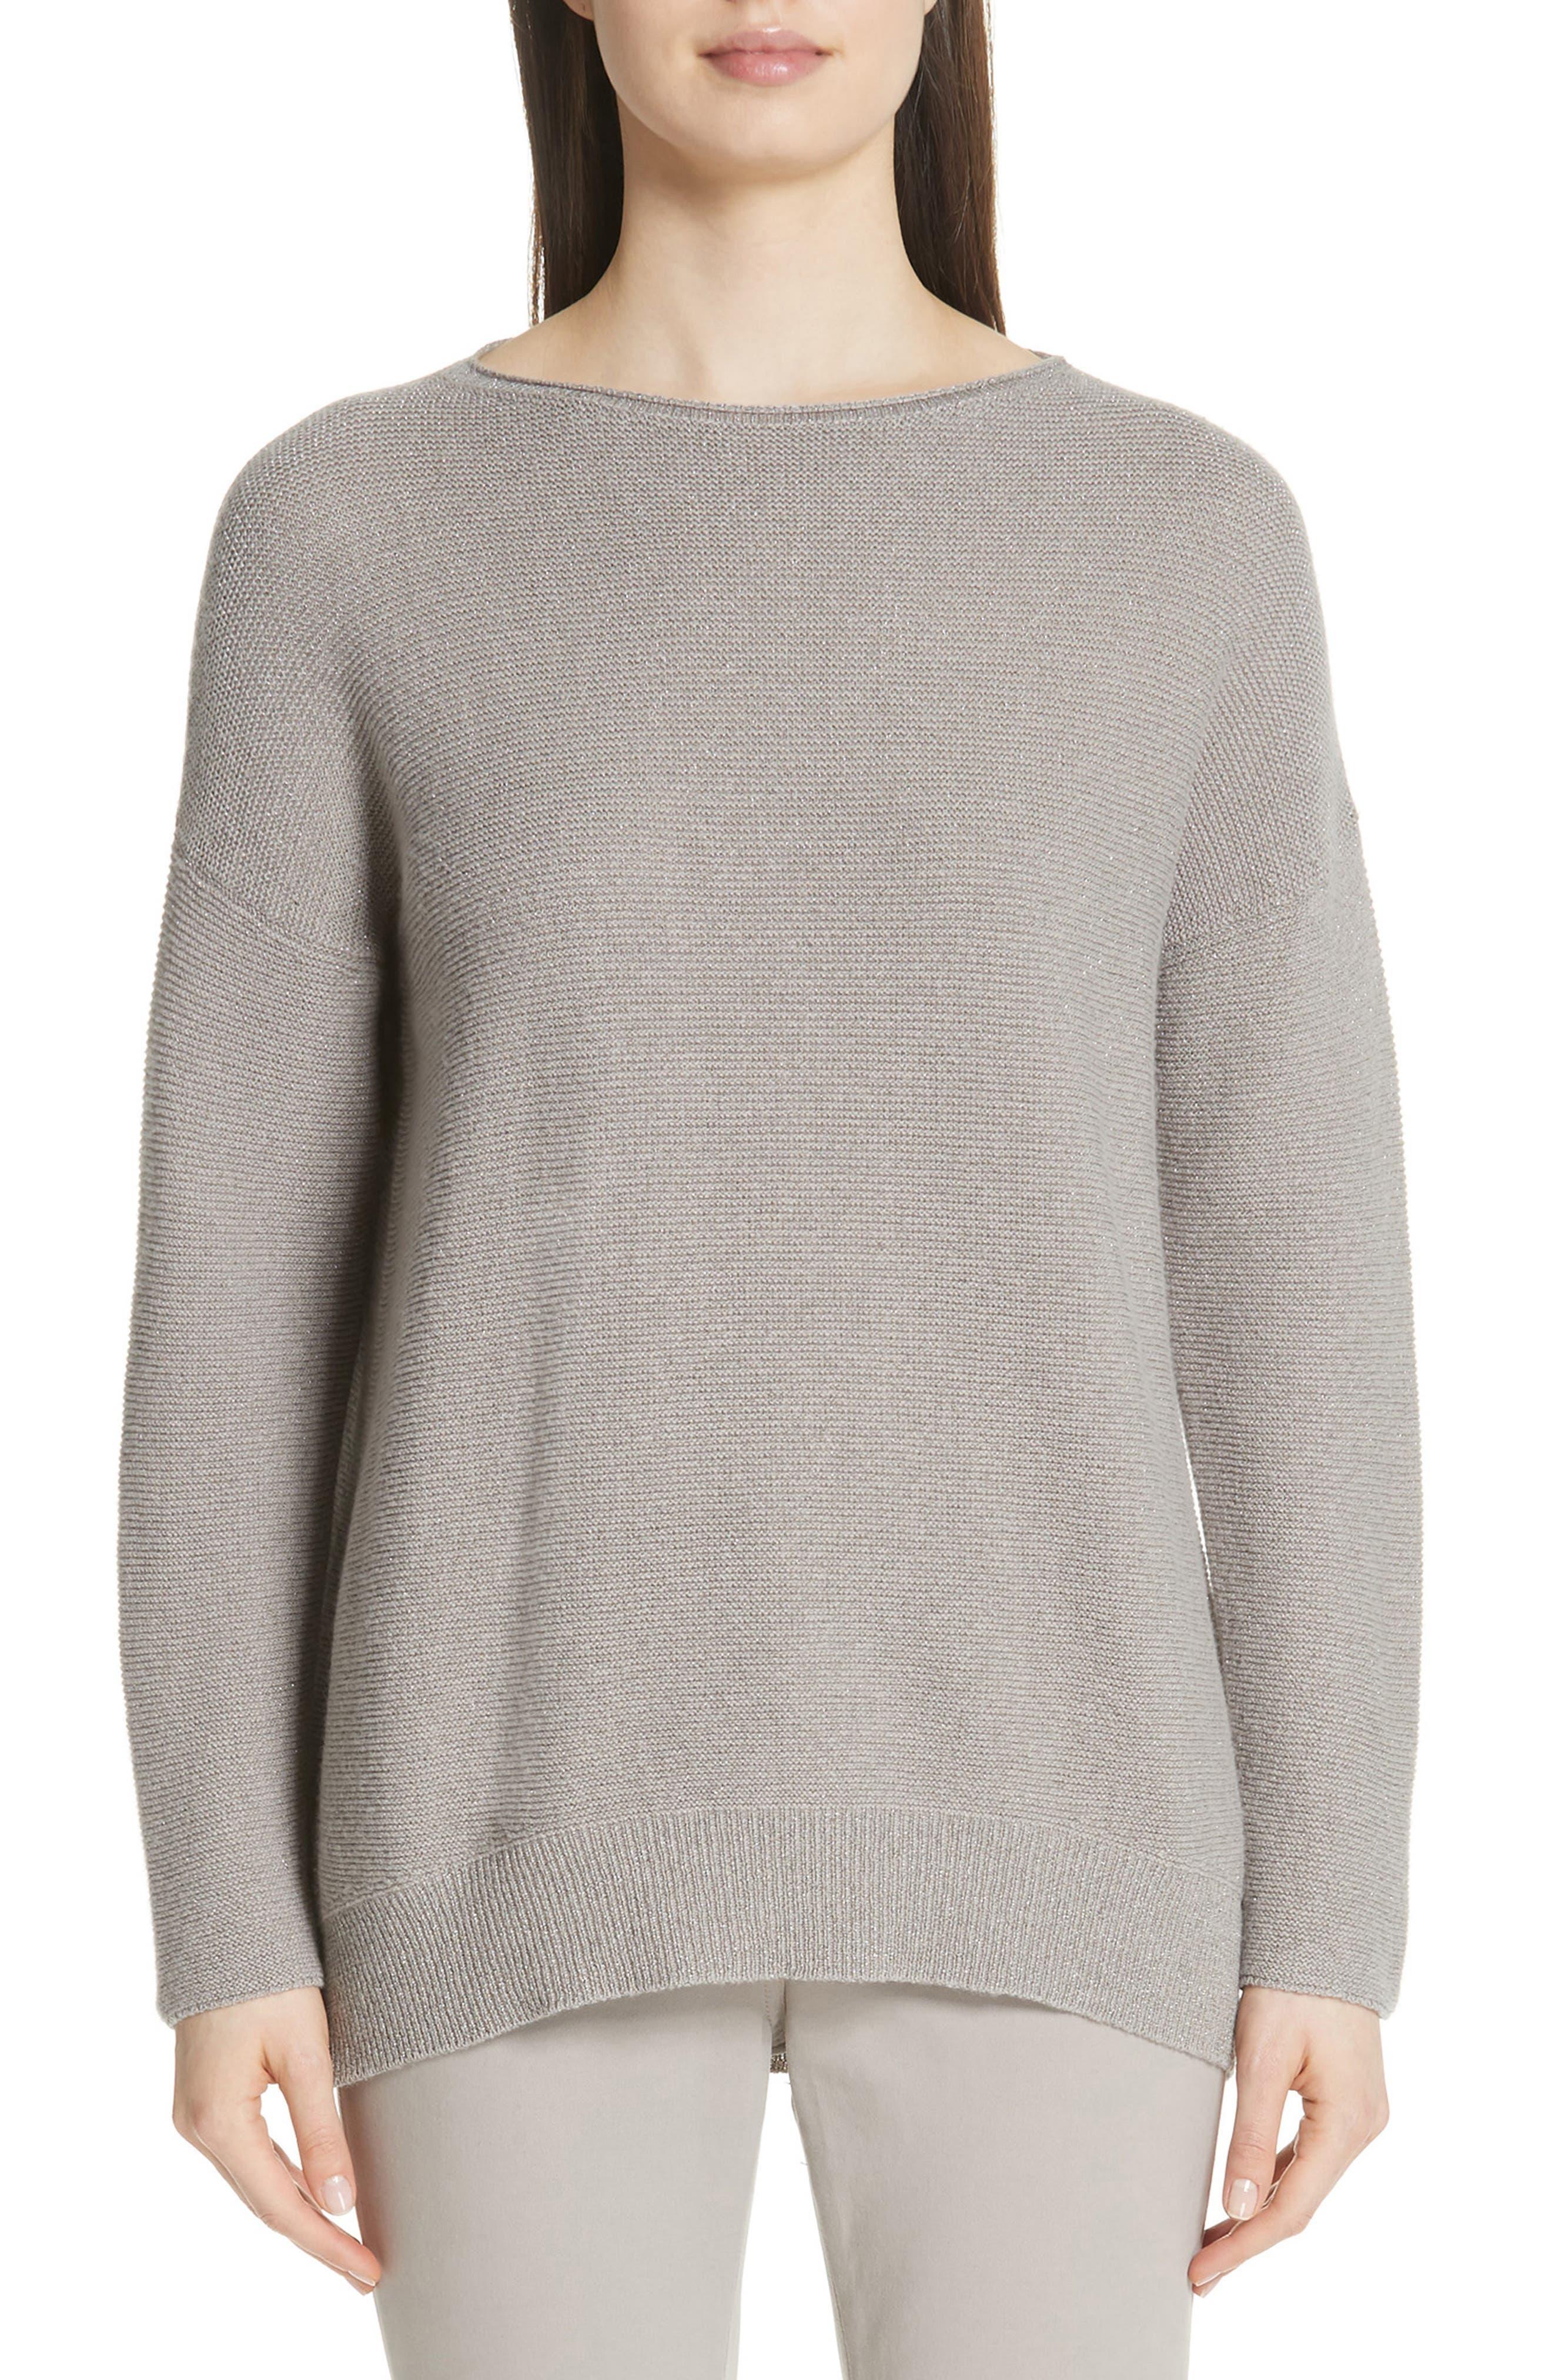 Fabiana Filippi Merino Wool, Silk & Cashmere Blend Sweater, US / 44 IT - Grey